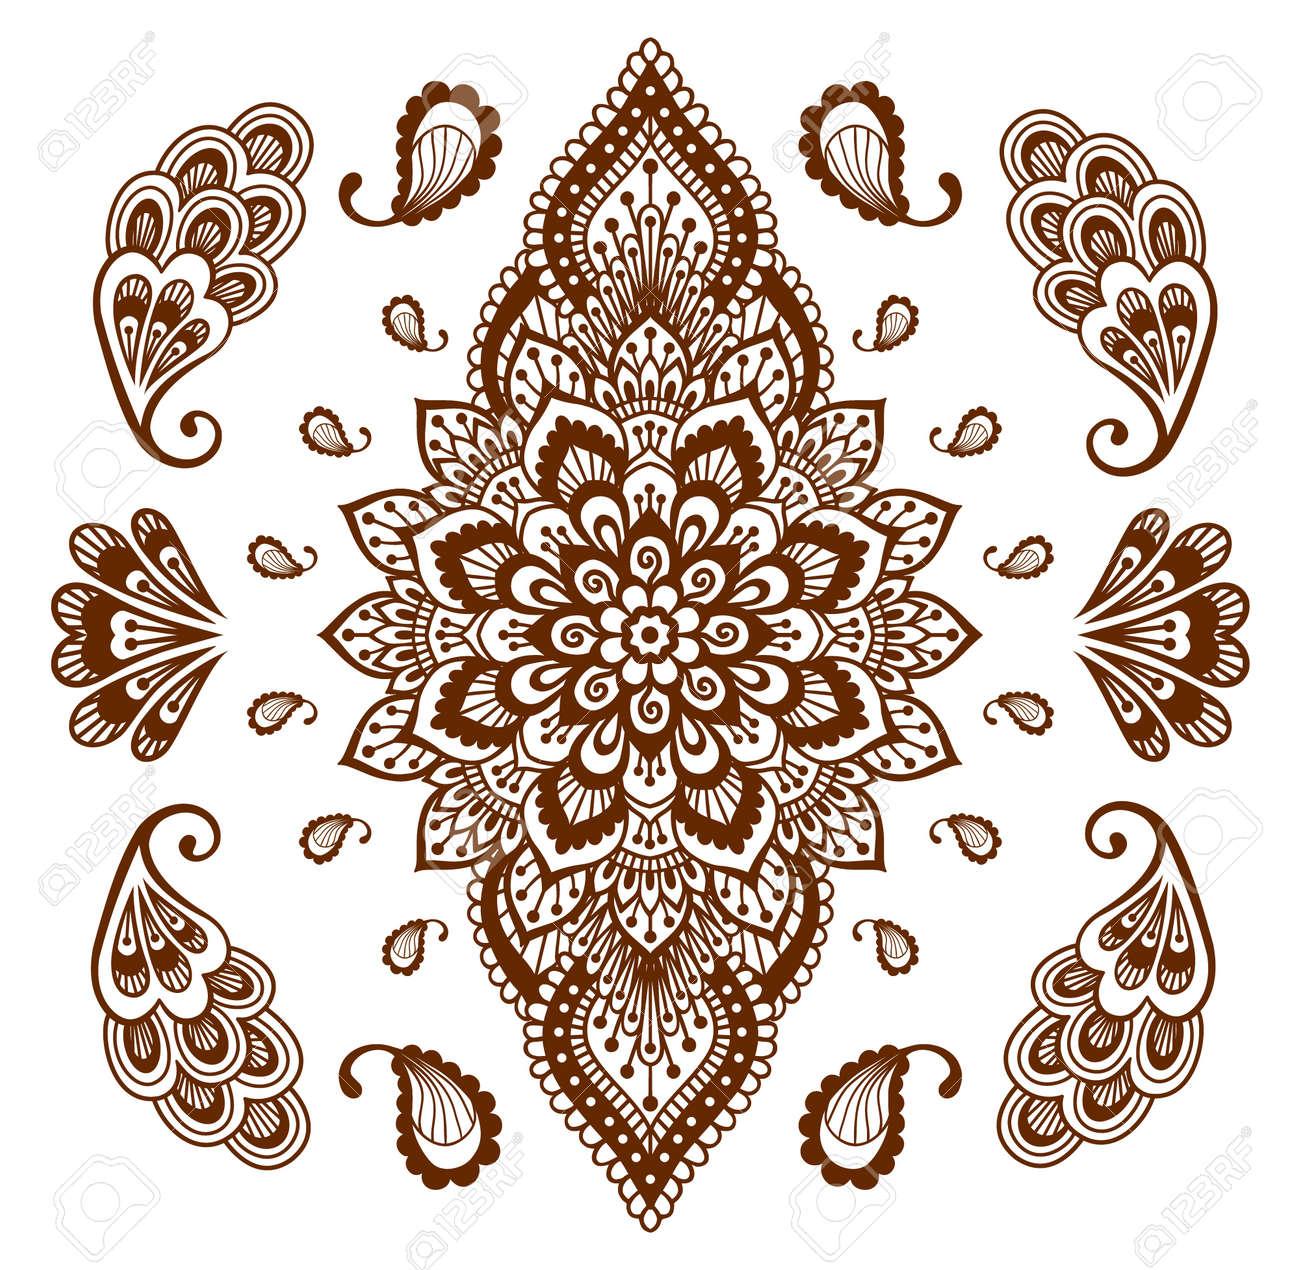 Indian Henna Tattoo Set Oriental Style Hand Drawn Decorative Design